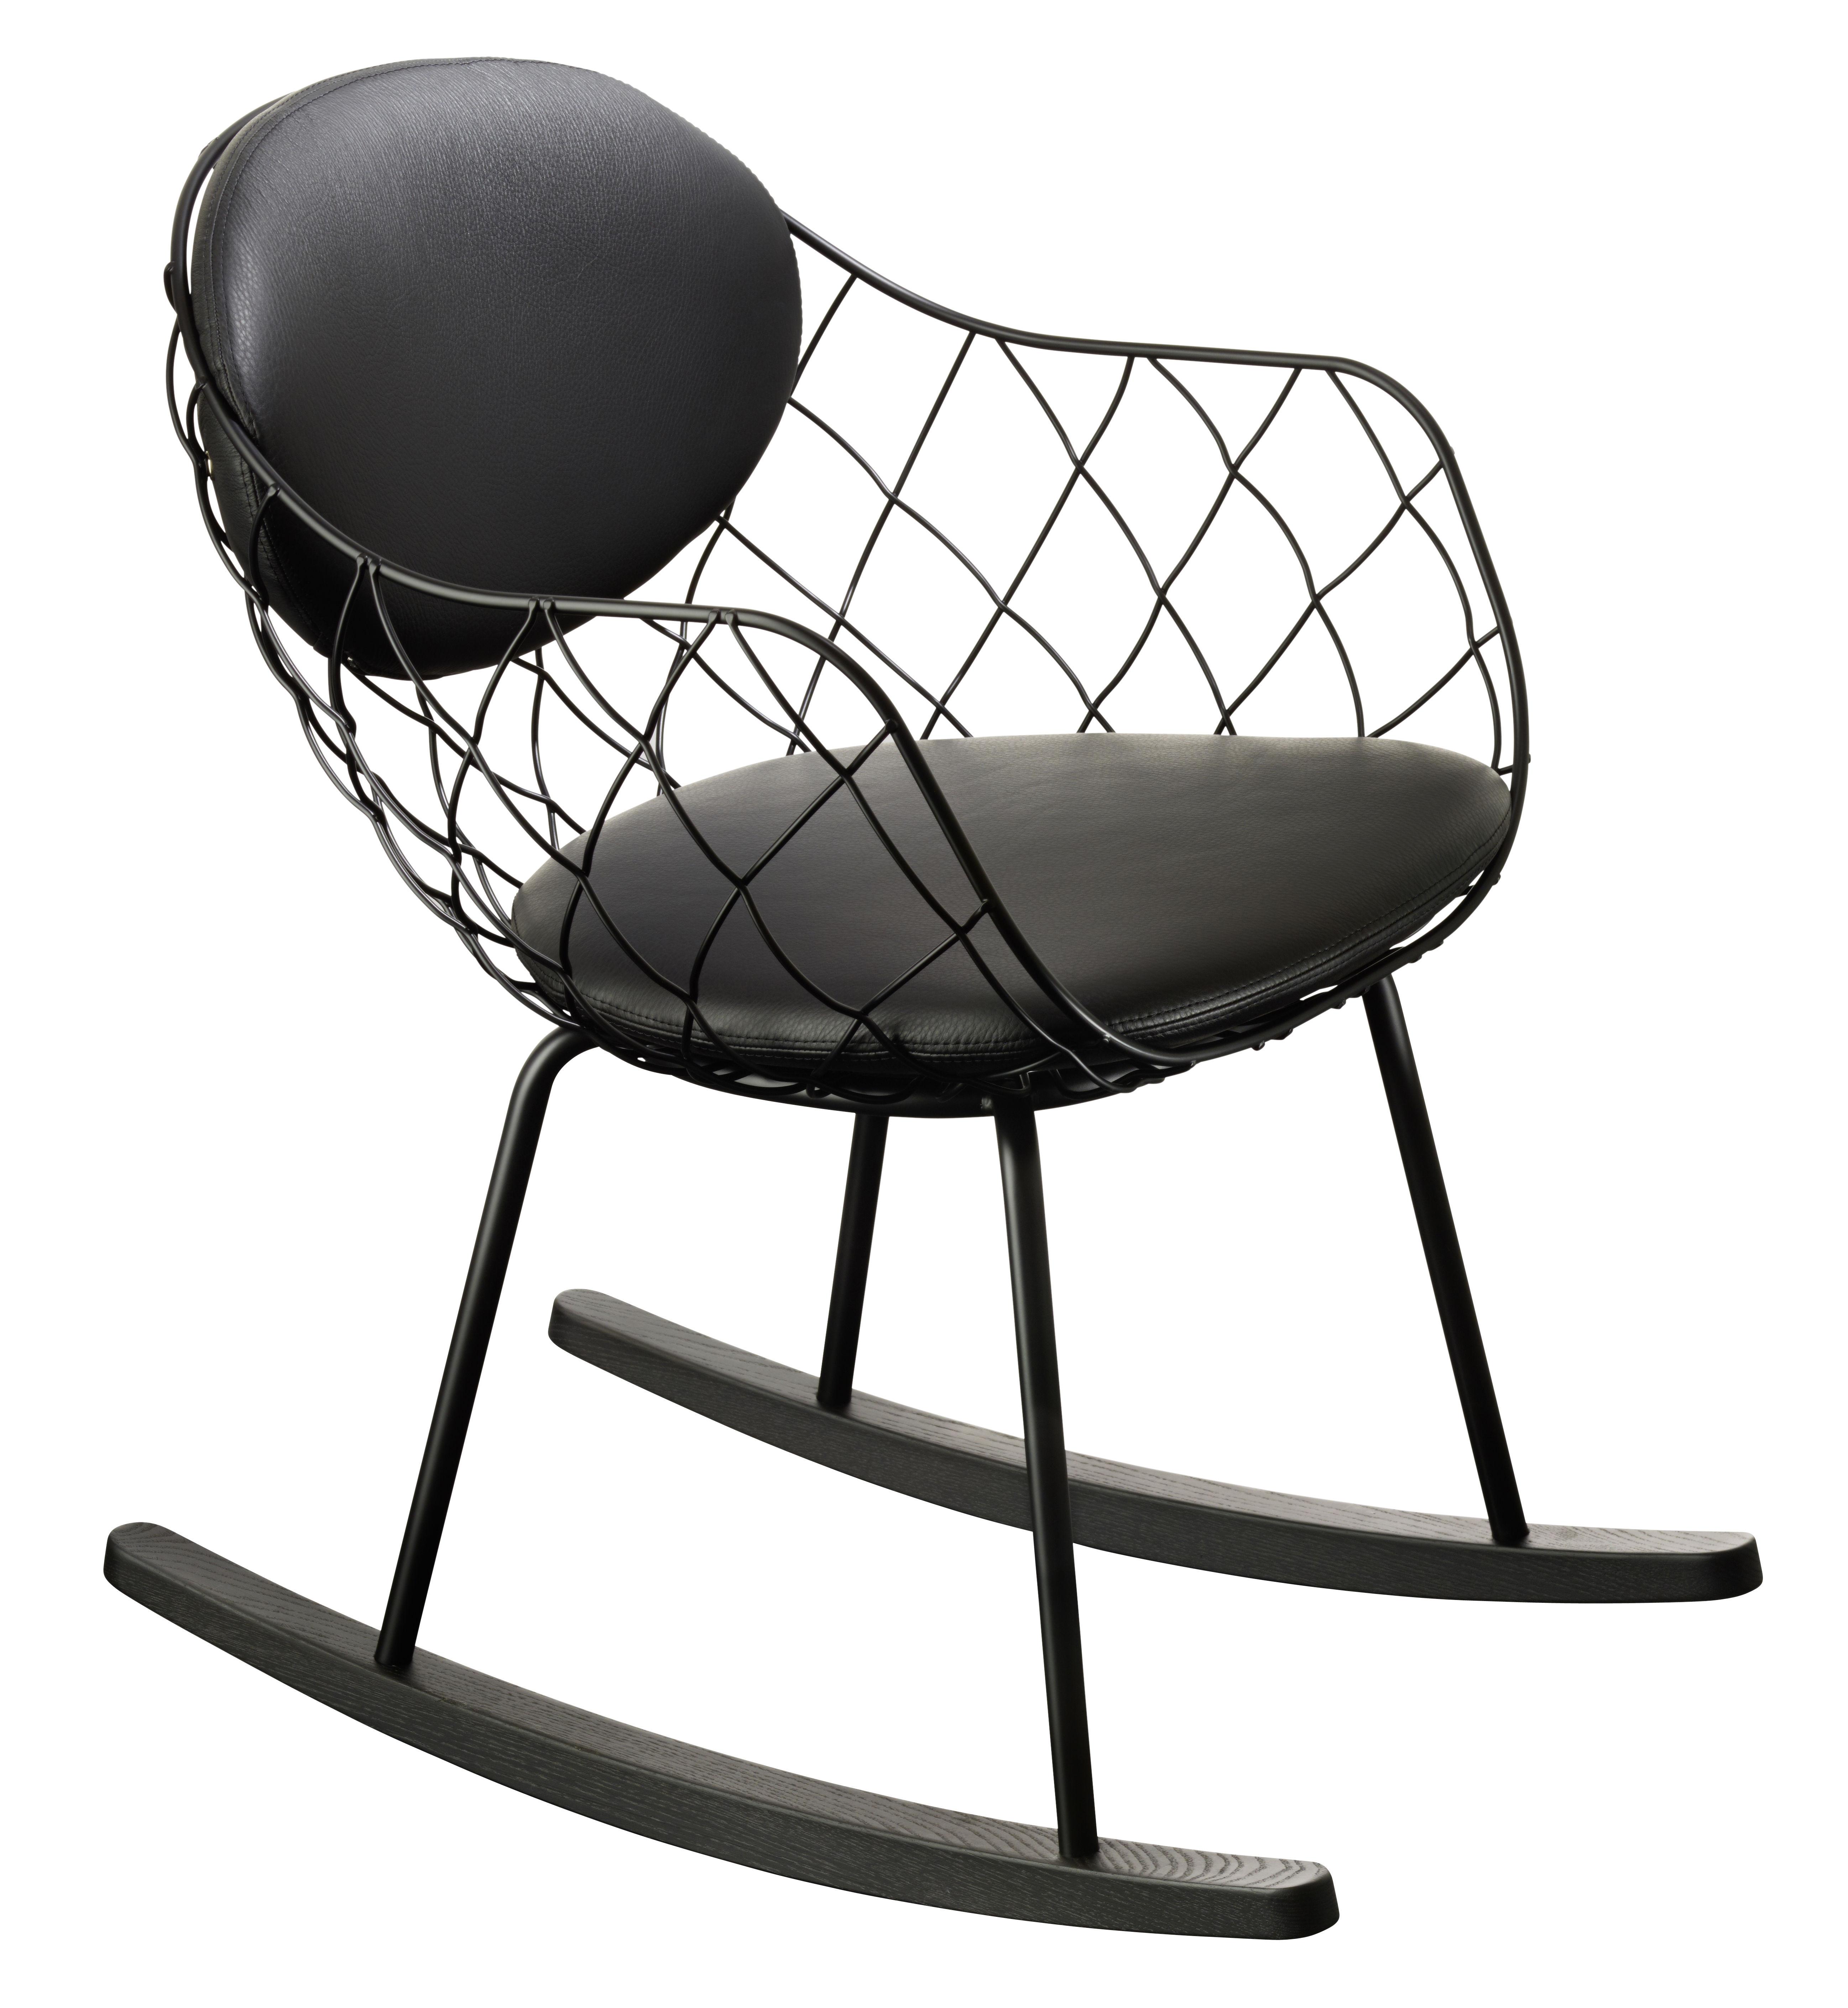 Möbel - Lounge Sessel - Pina Schaukelstuhl / Lederbezug - Füße aus Holz - Magis - Lederbezug schwarz / Kufen schwarz - gefärbte Buche, gefirnister Stahl, Leder